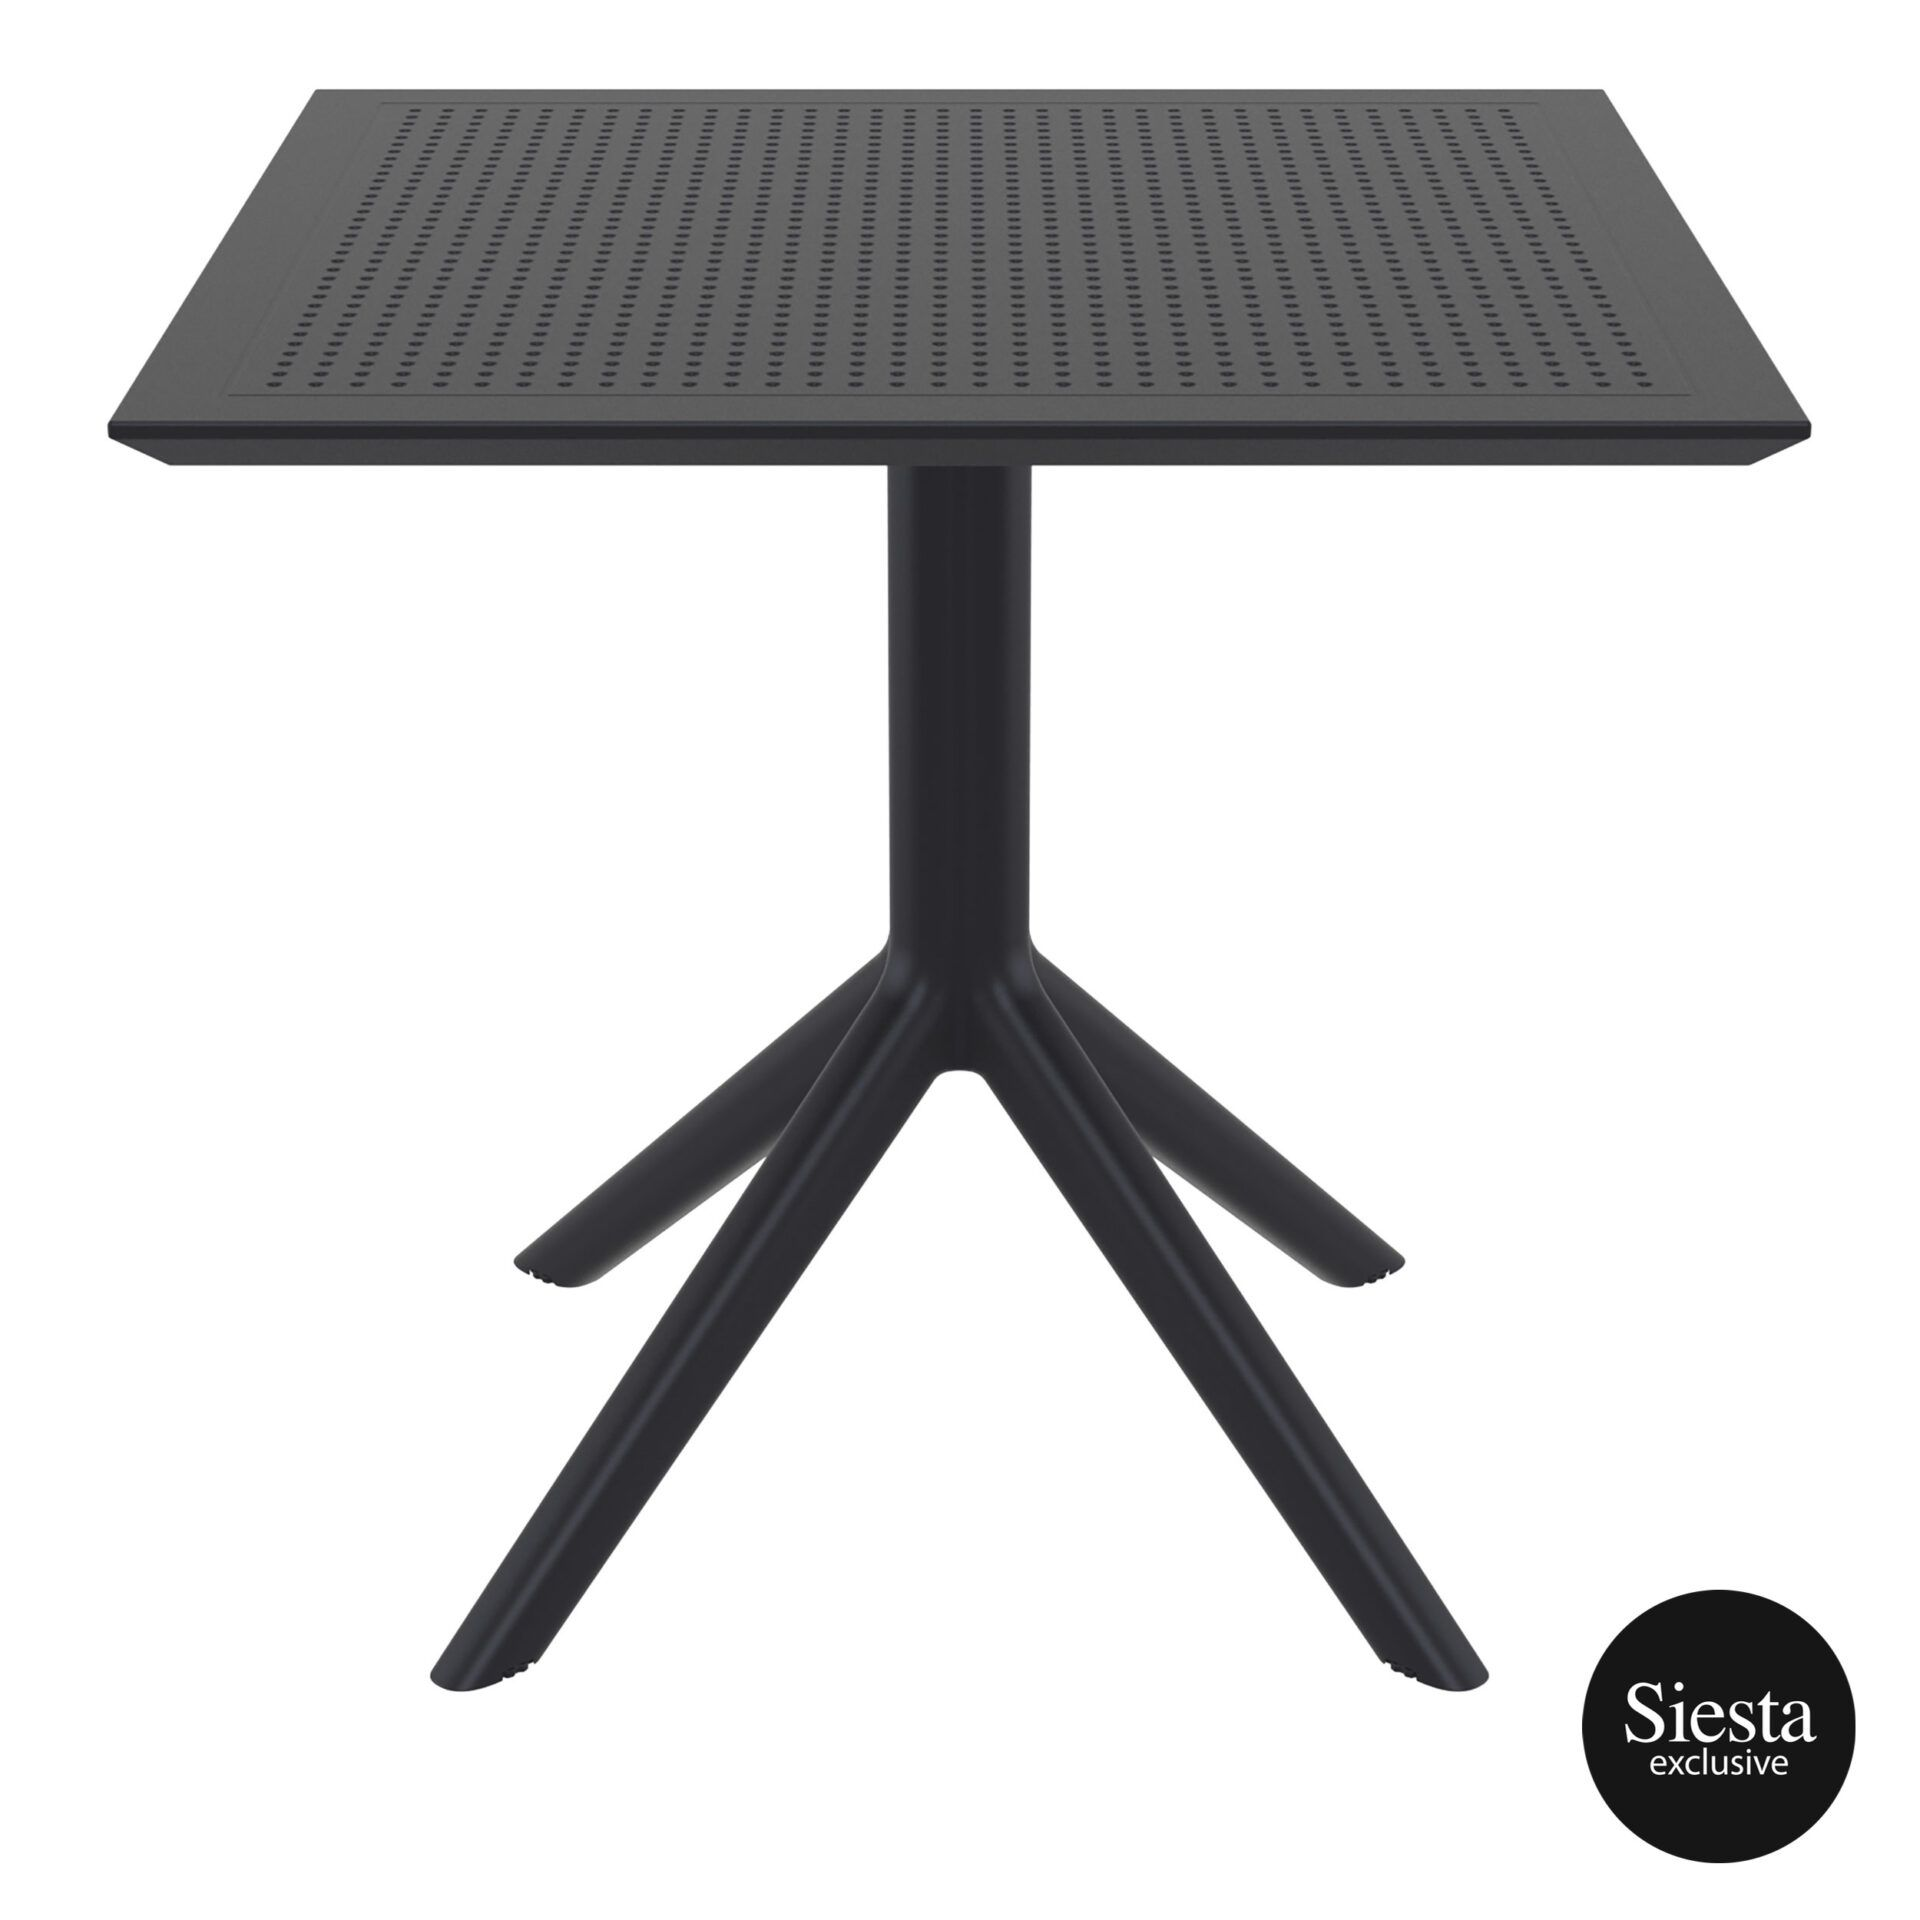 polypropylene outdoor cafe sky table 80 black front 1